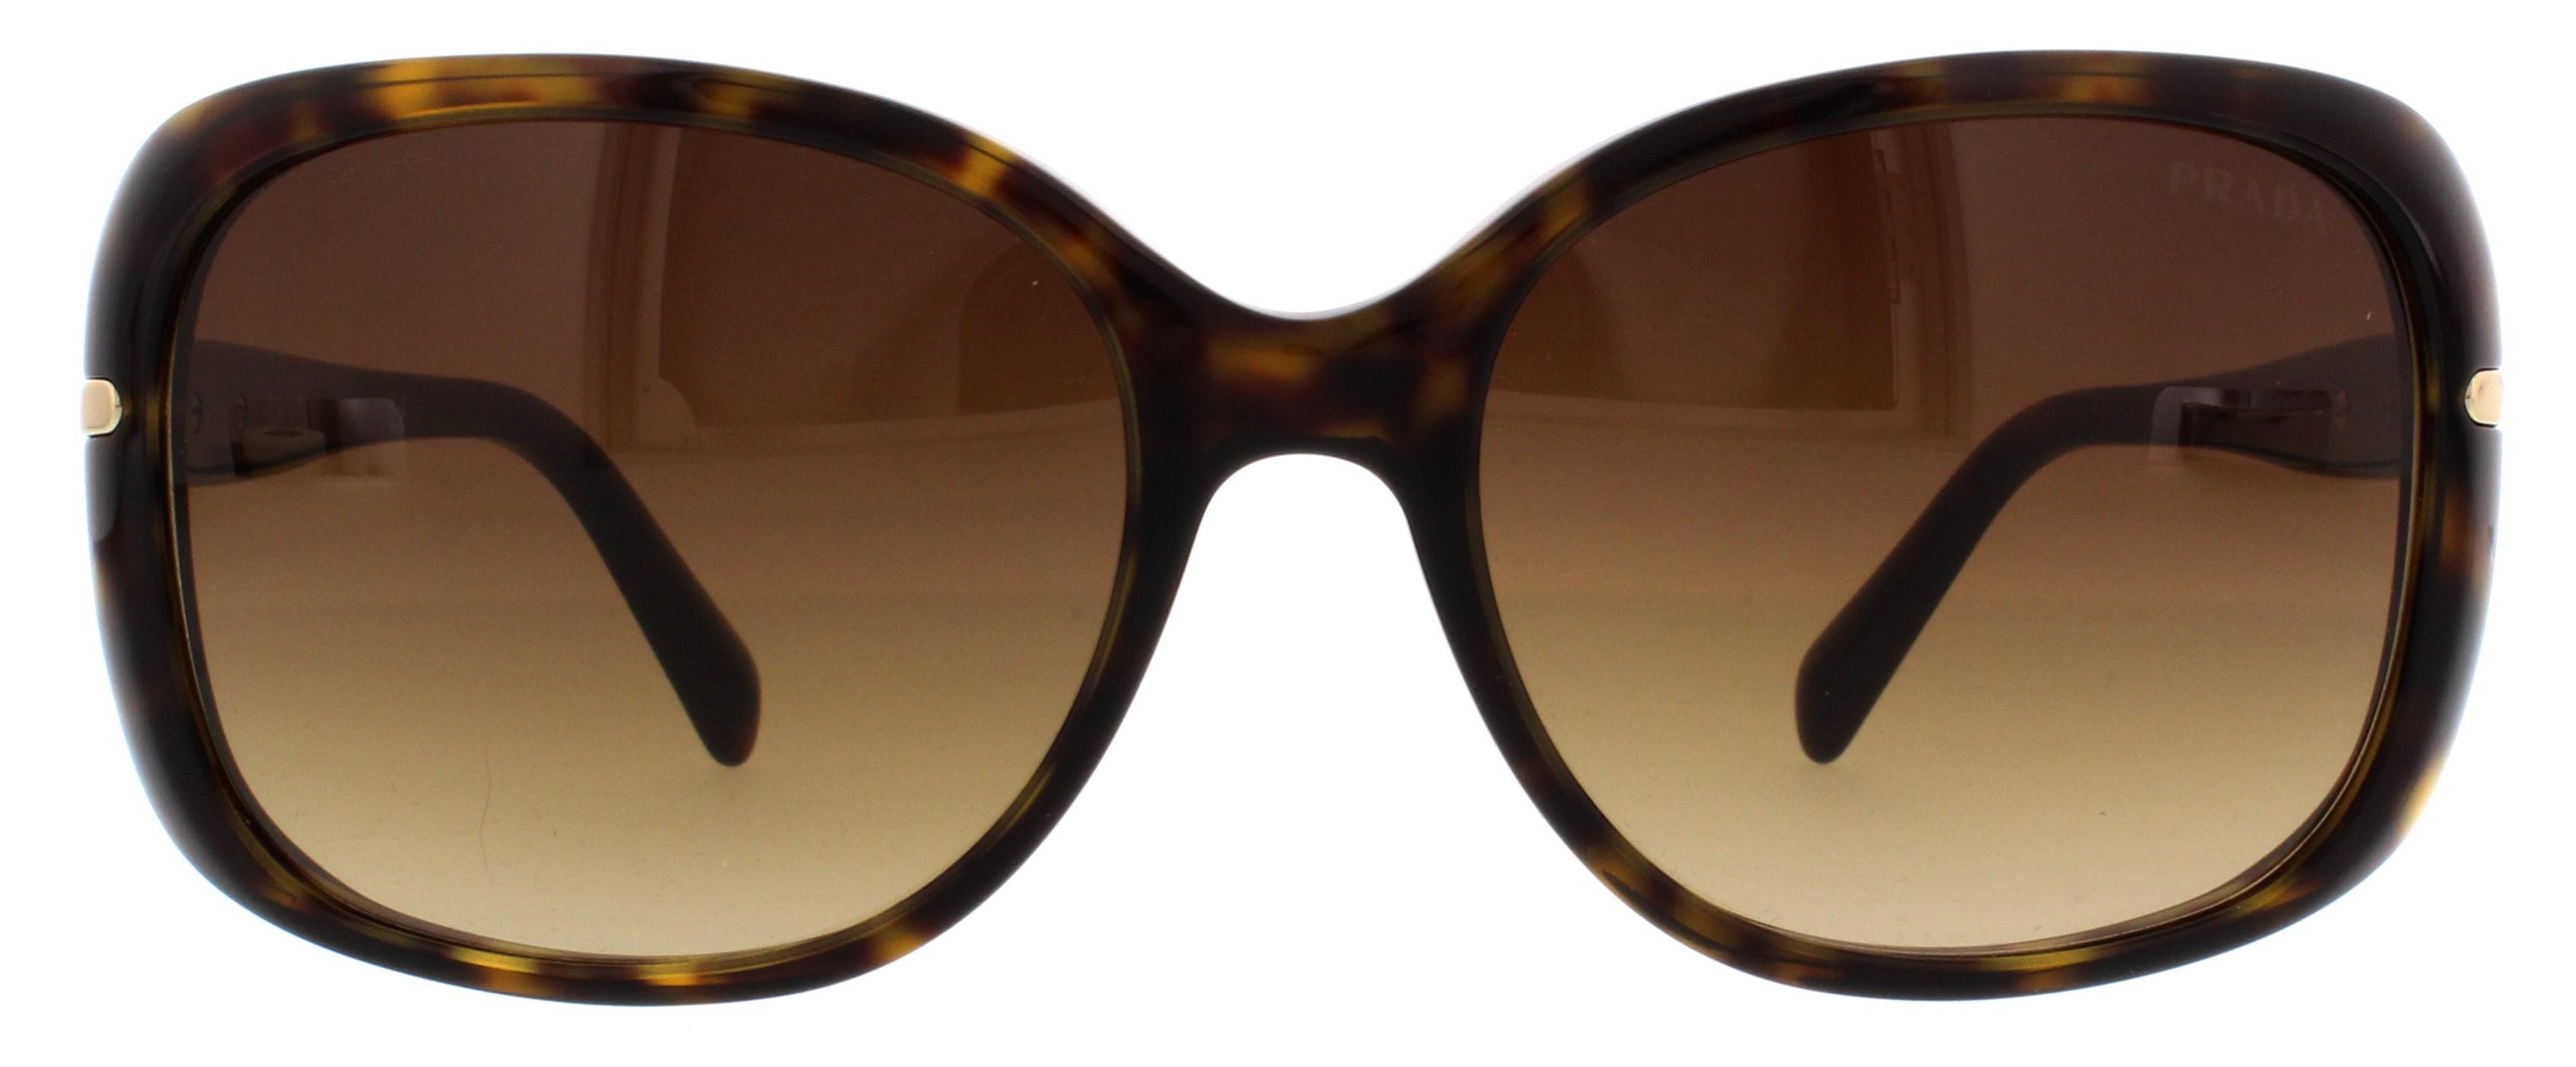 f5c80181798bc ... discount code for prada sunglasses pr08os 2au6s1 havana 57mm da772  2d442 ...